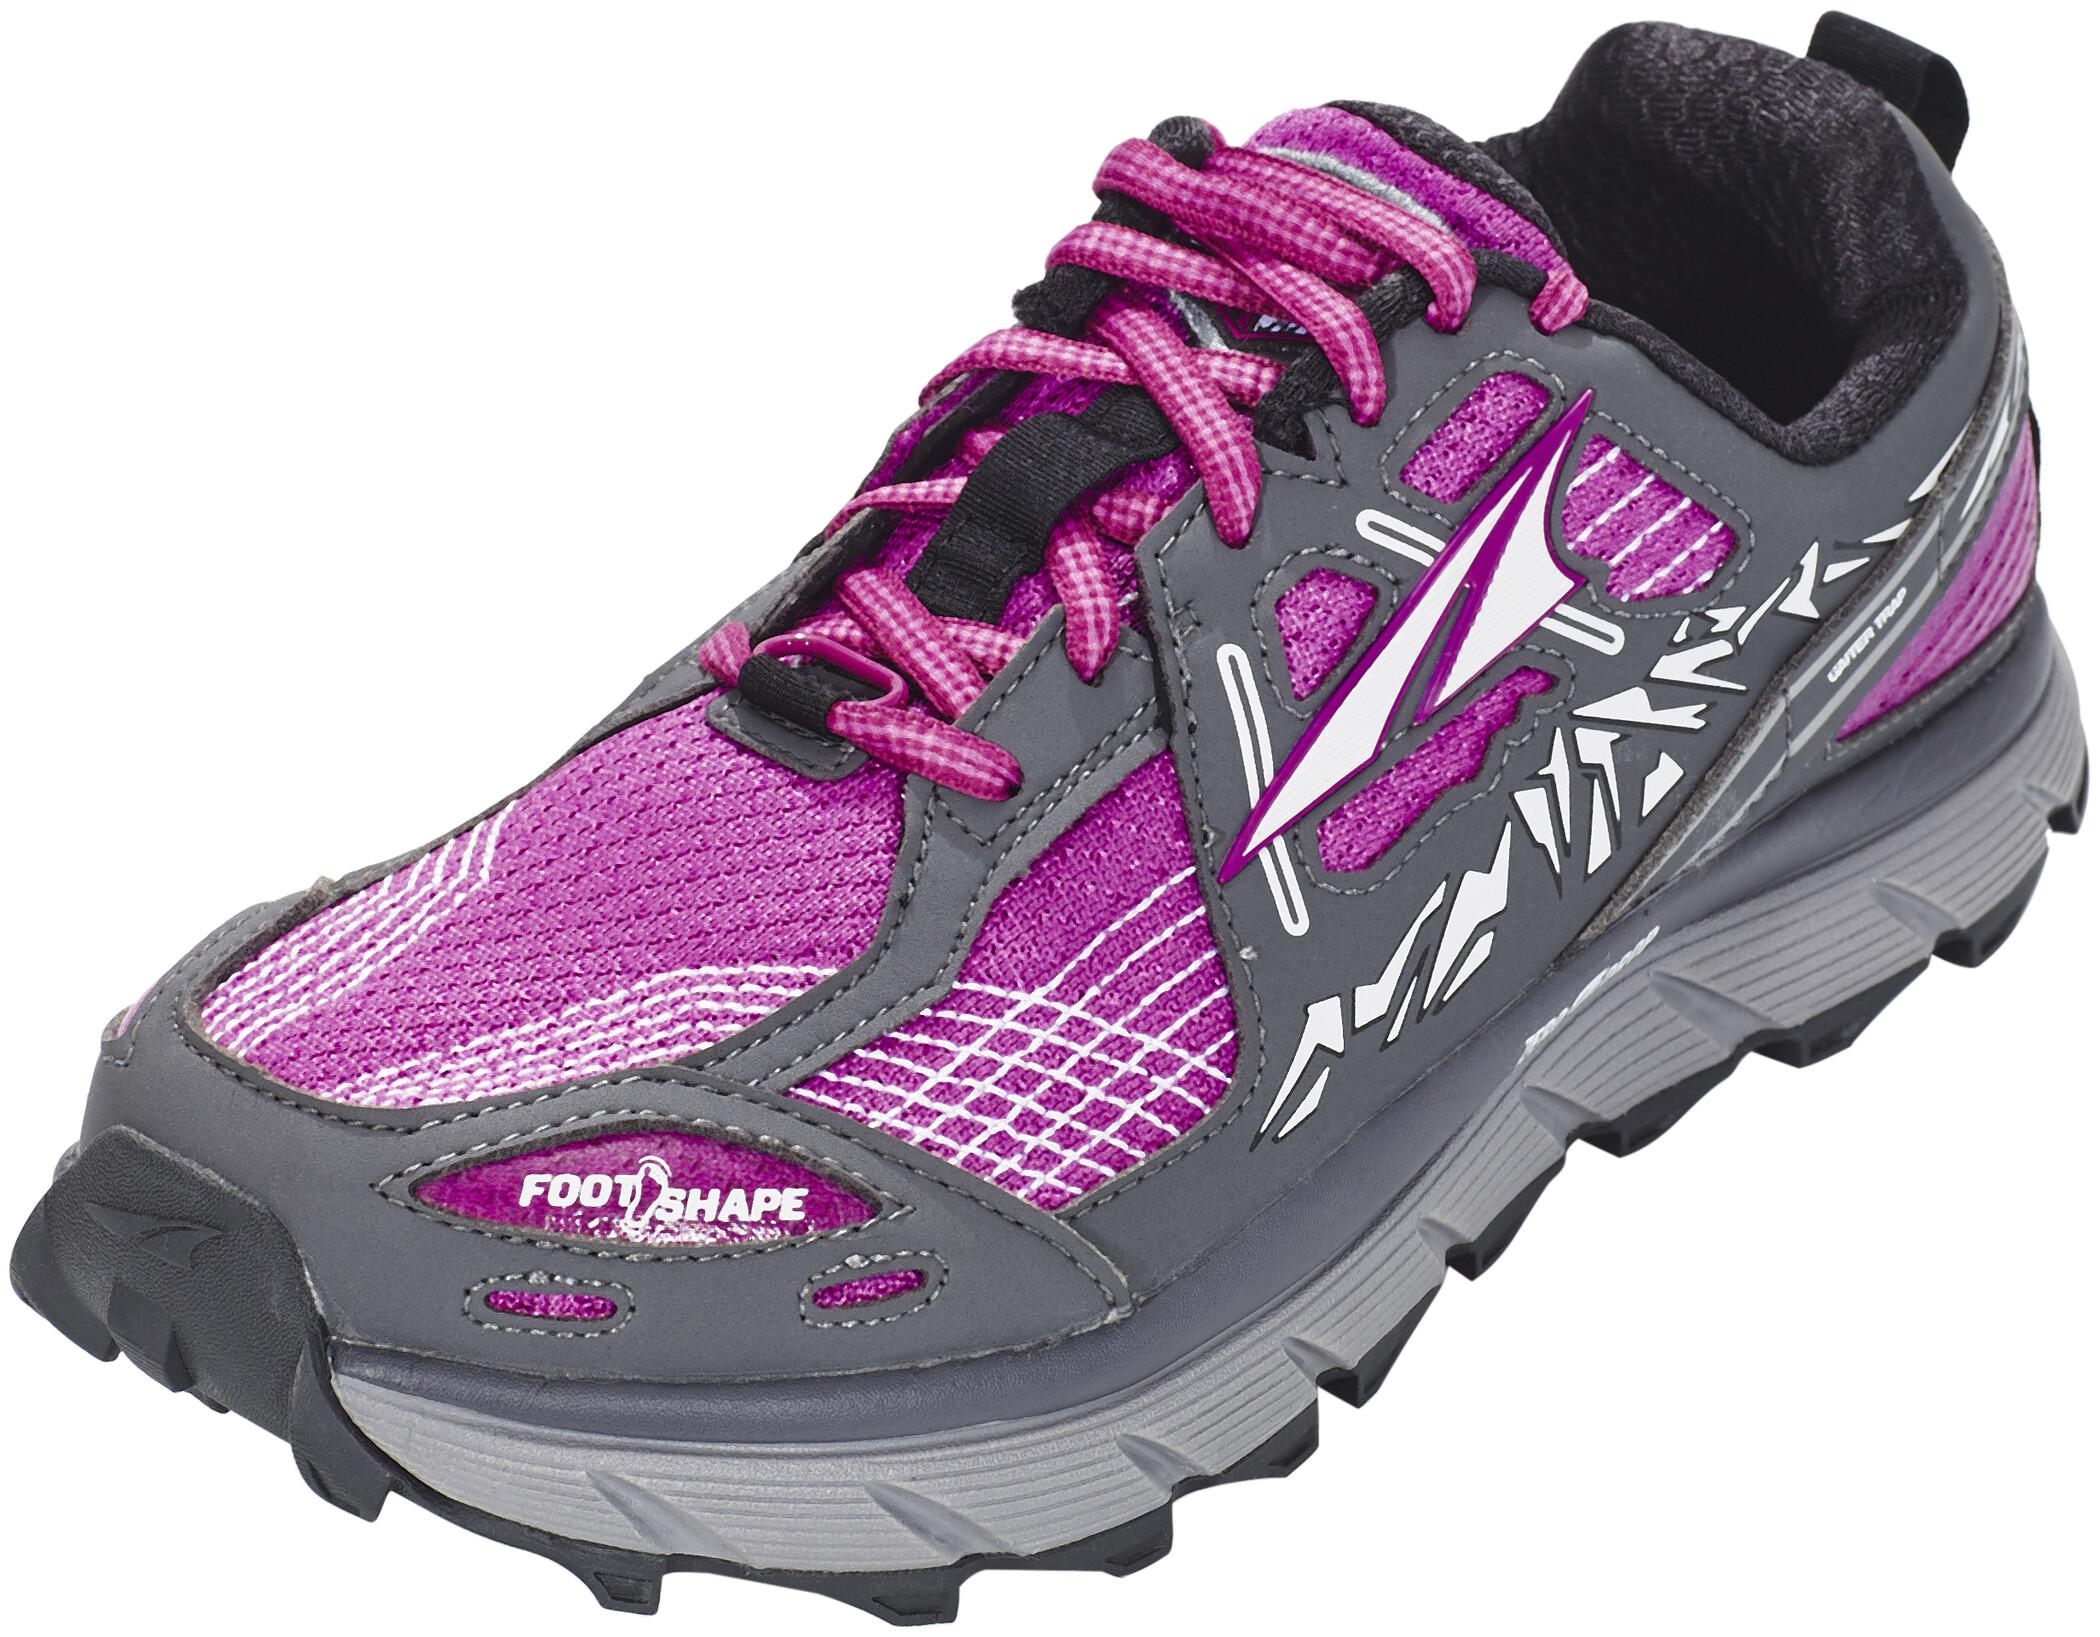 Altra Lone Peak 3.5 Trail Running Schuhe Damen pink and gray